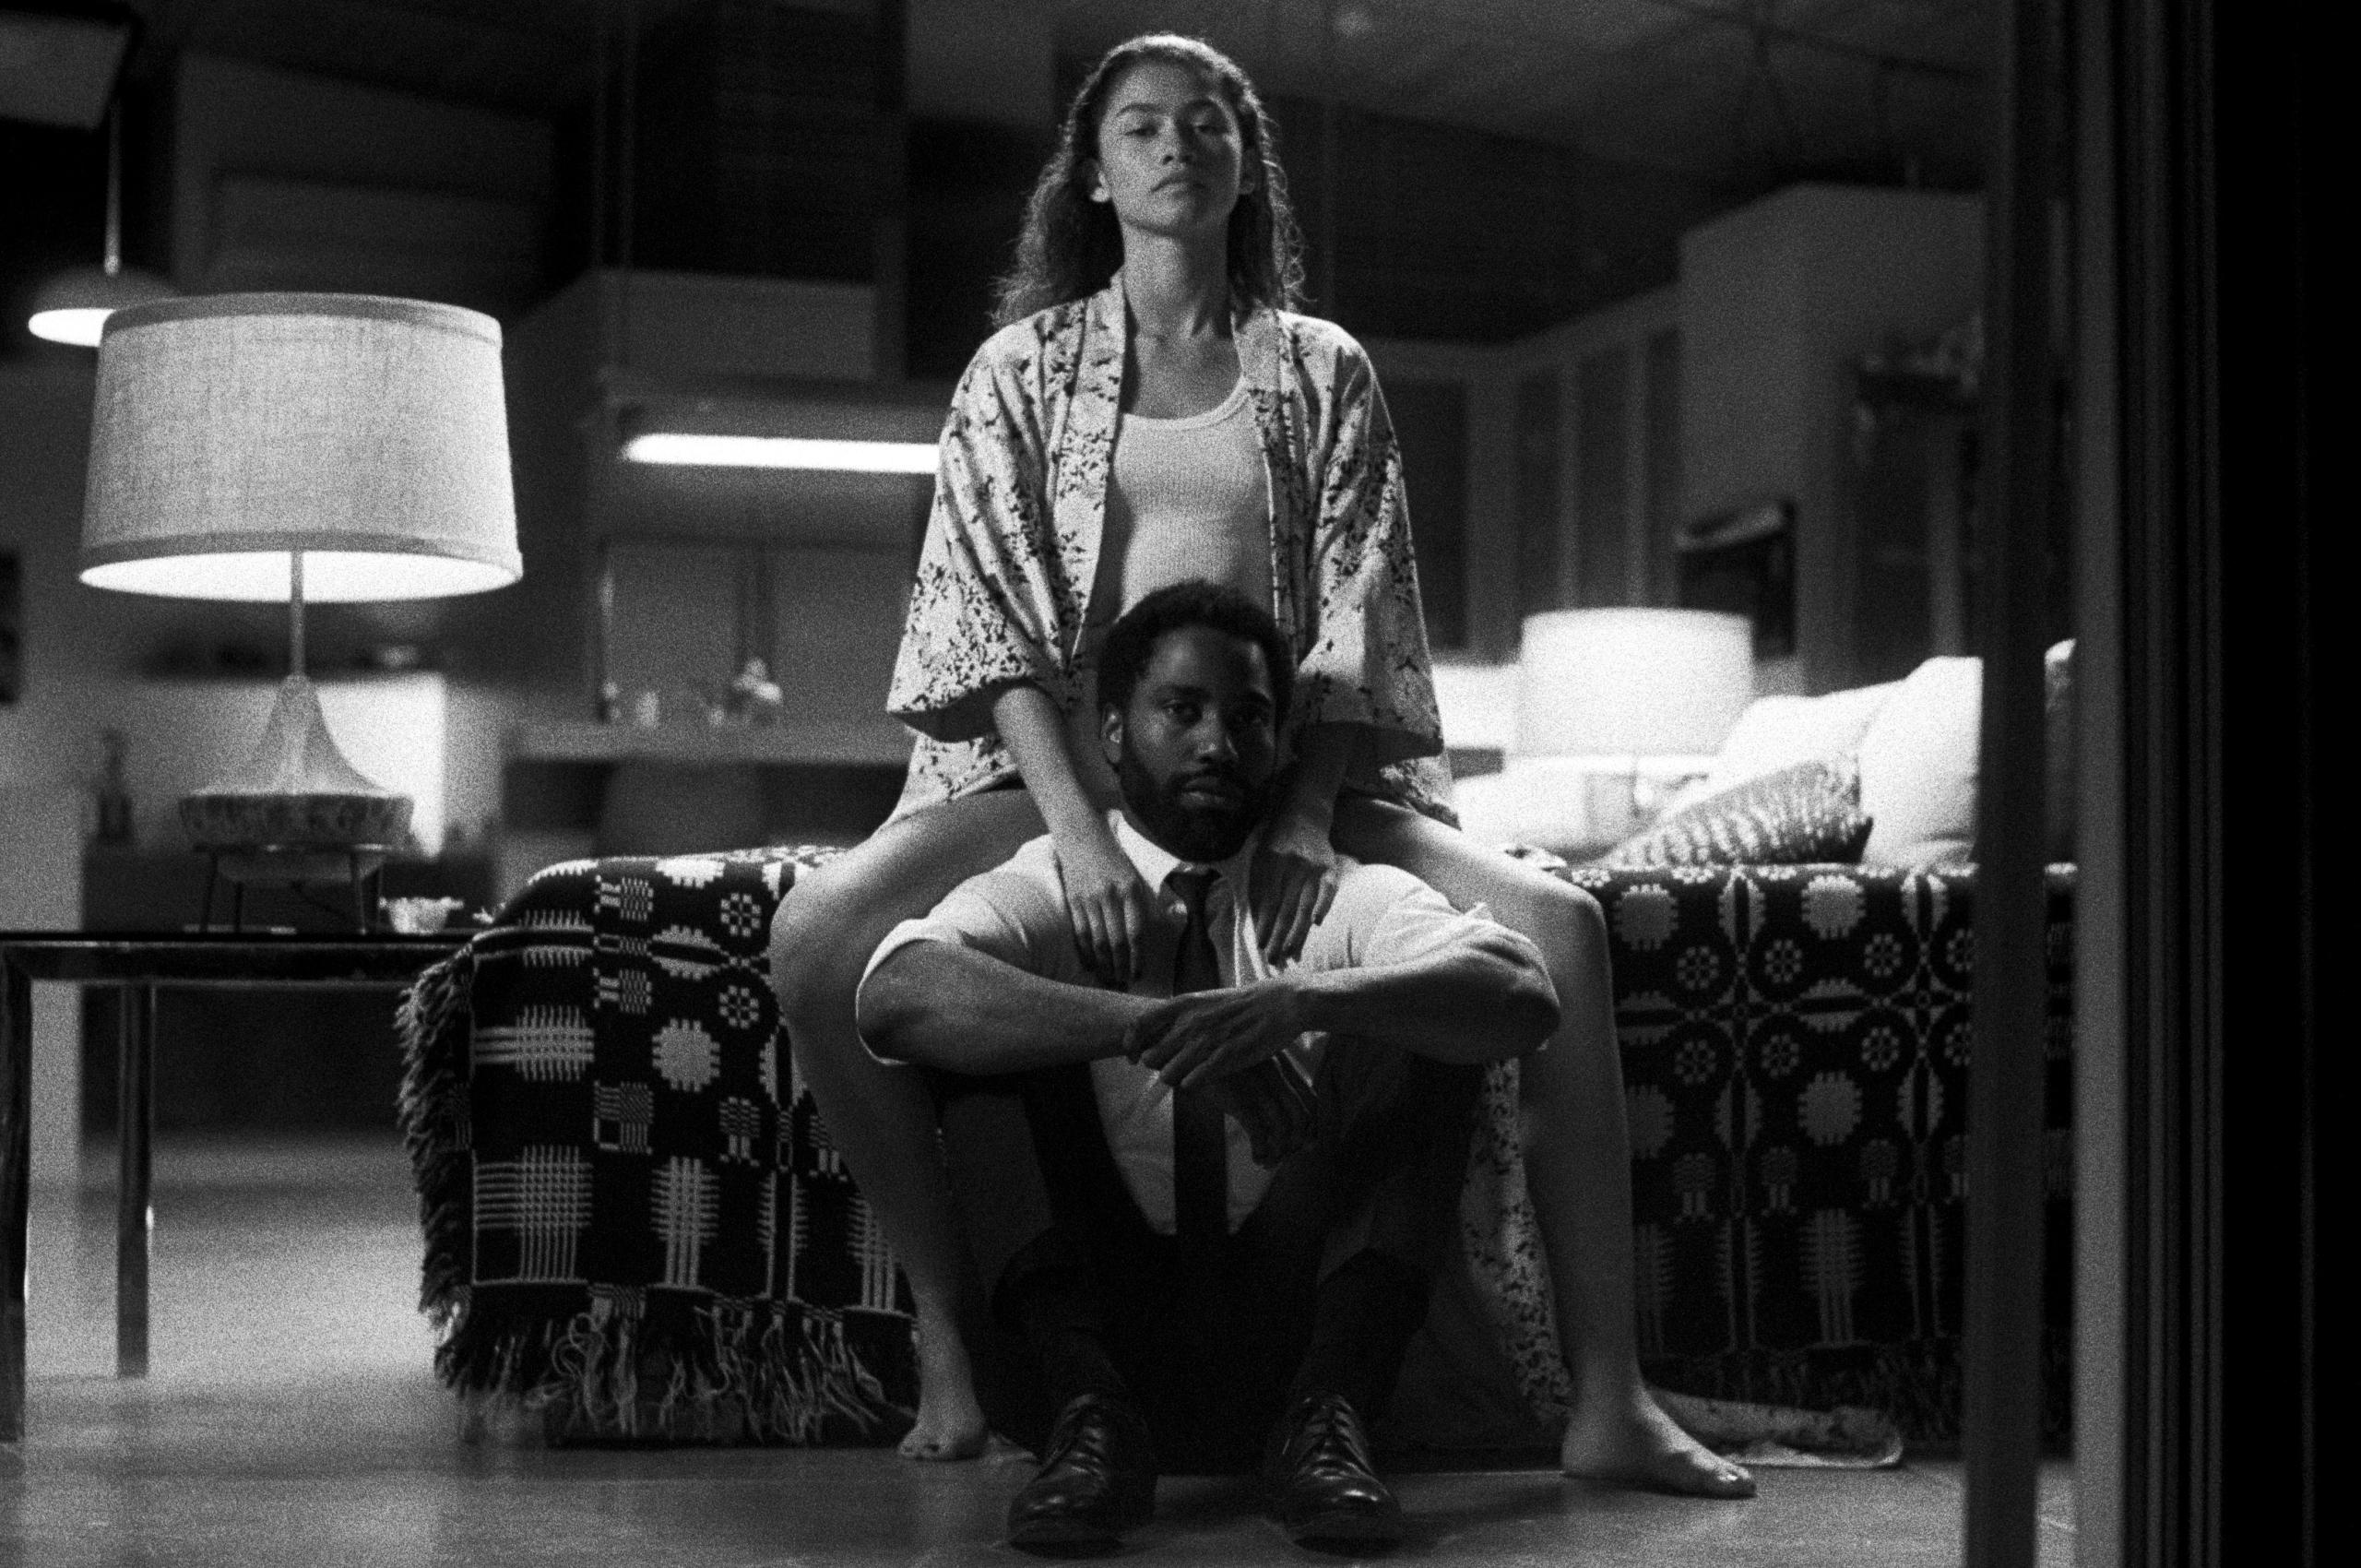 Zendaya & John Washington from Malcolm & Marie Wallpaper in 2560x1700 Resolution